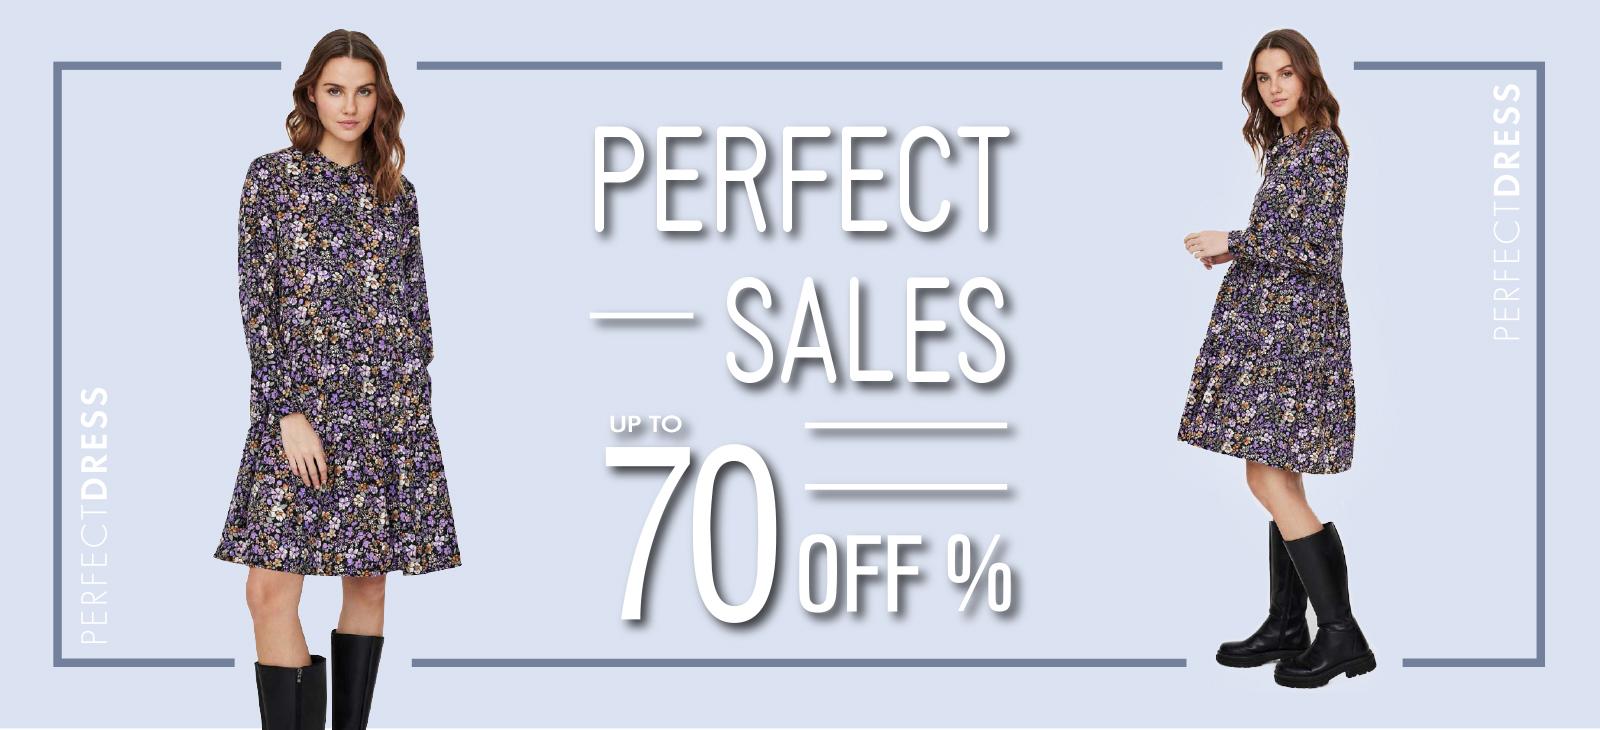 9b159ff13382 Νέες Αφίξεις. vintage φόρεμα chic blue Rosy porcelain